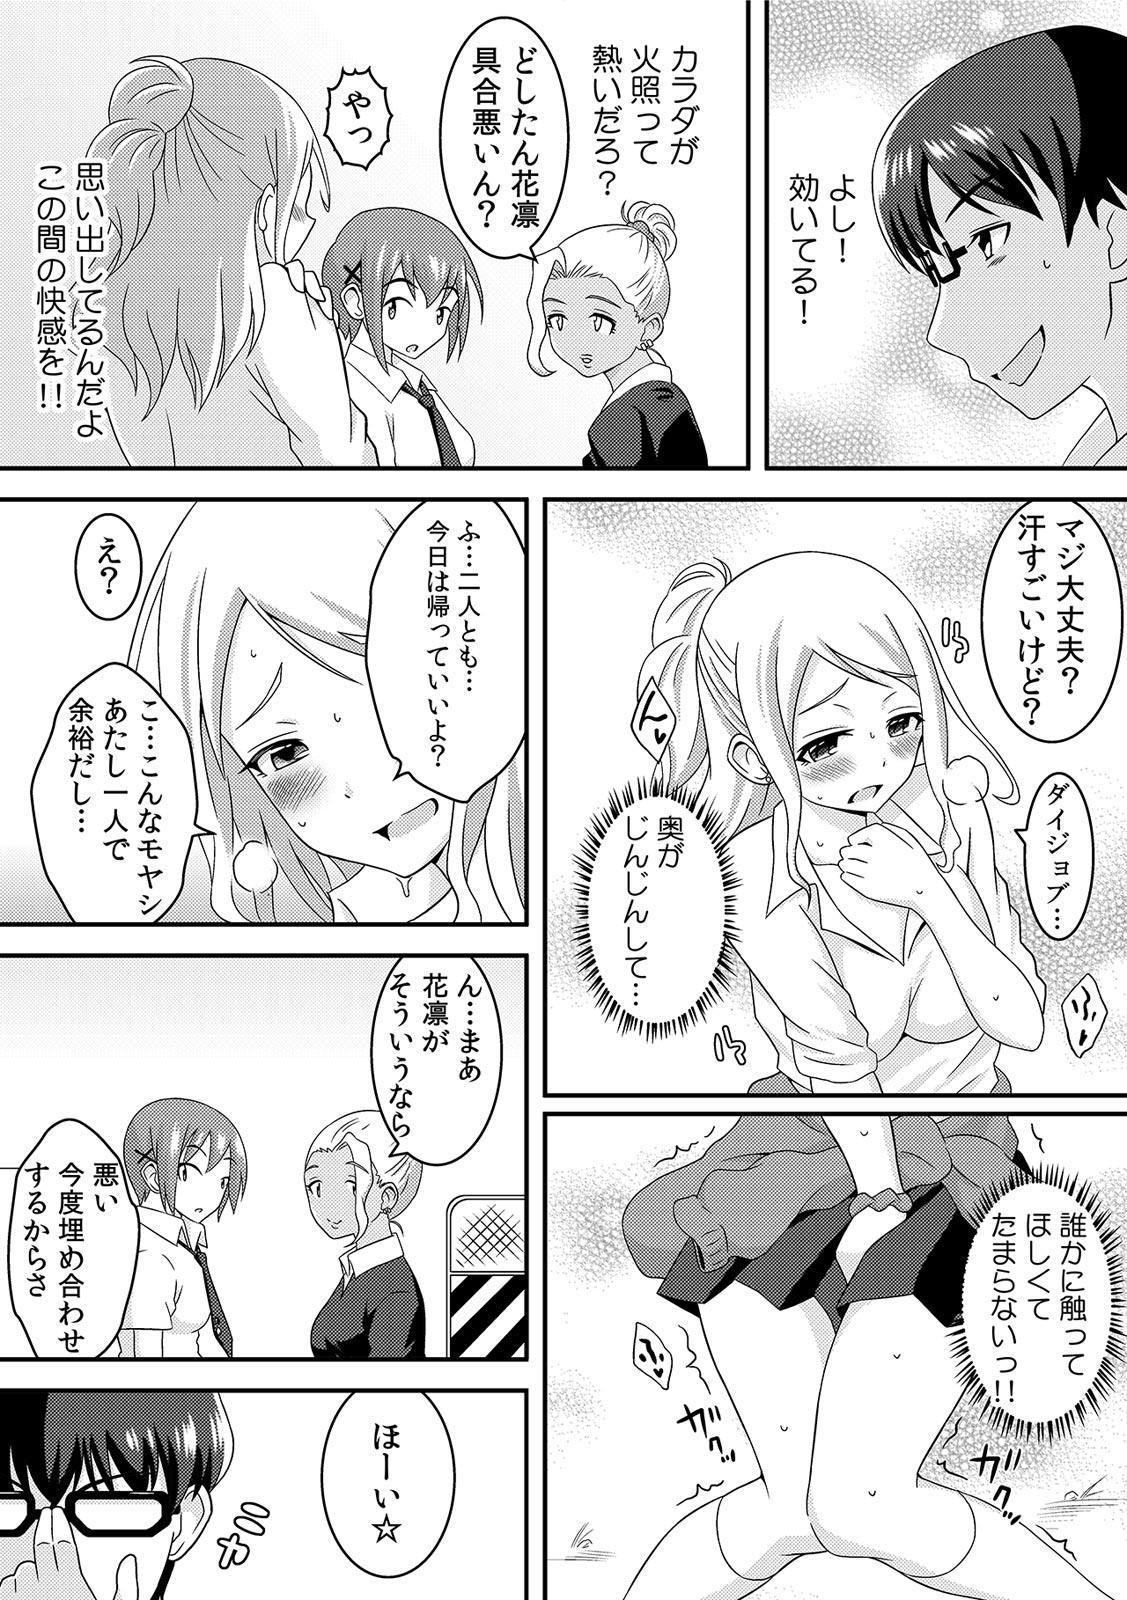 [Yuzu Ramune] Yankee Musume o Ecchi de Kousei!? ~Jugyou de Ijirare Shitagi ga Gusshori~ 1 22